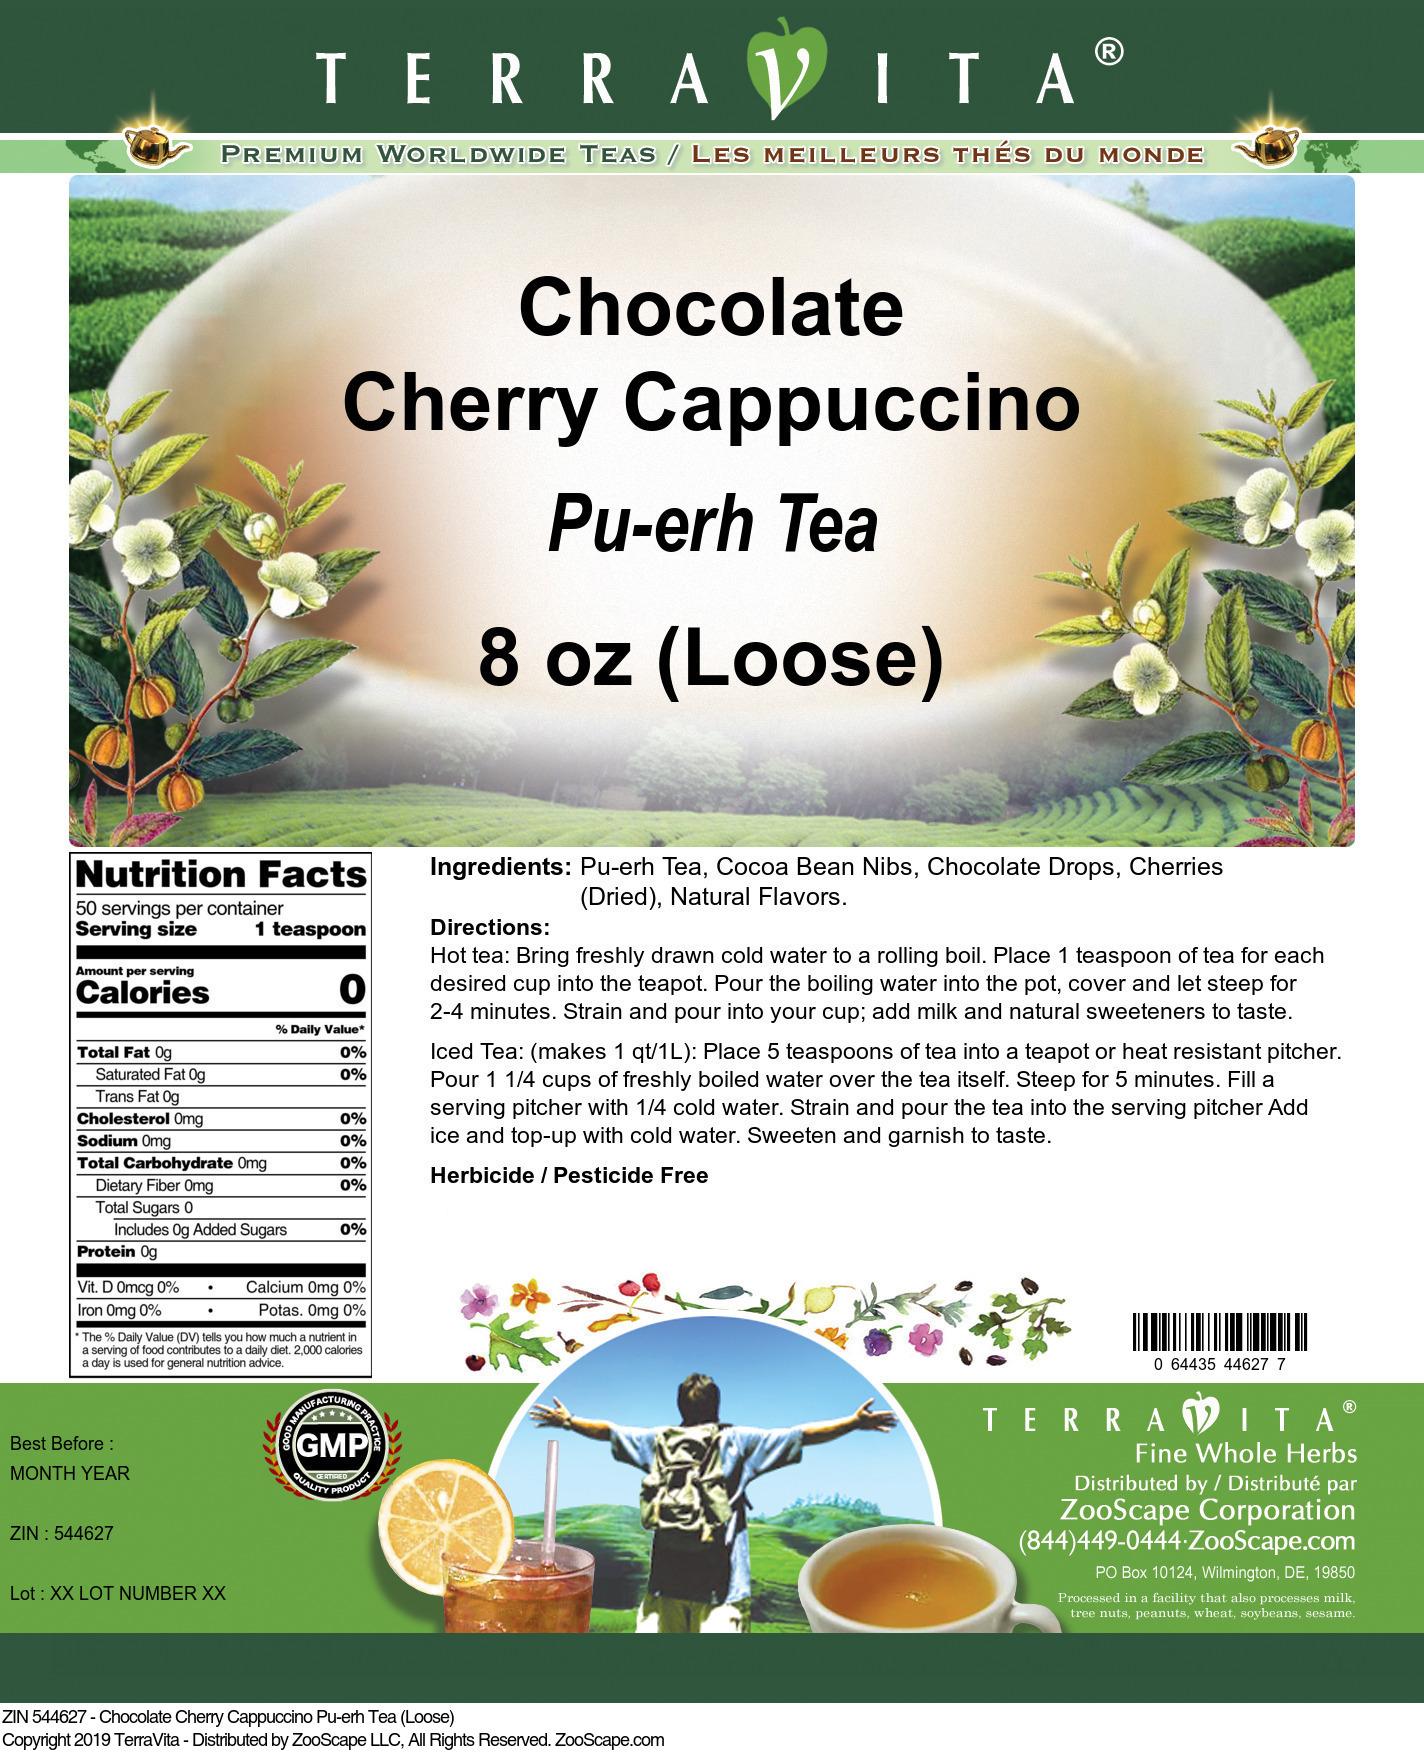 Chocolate Cherry Cappuccino Pu-erh Tea